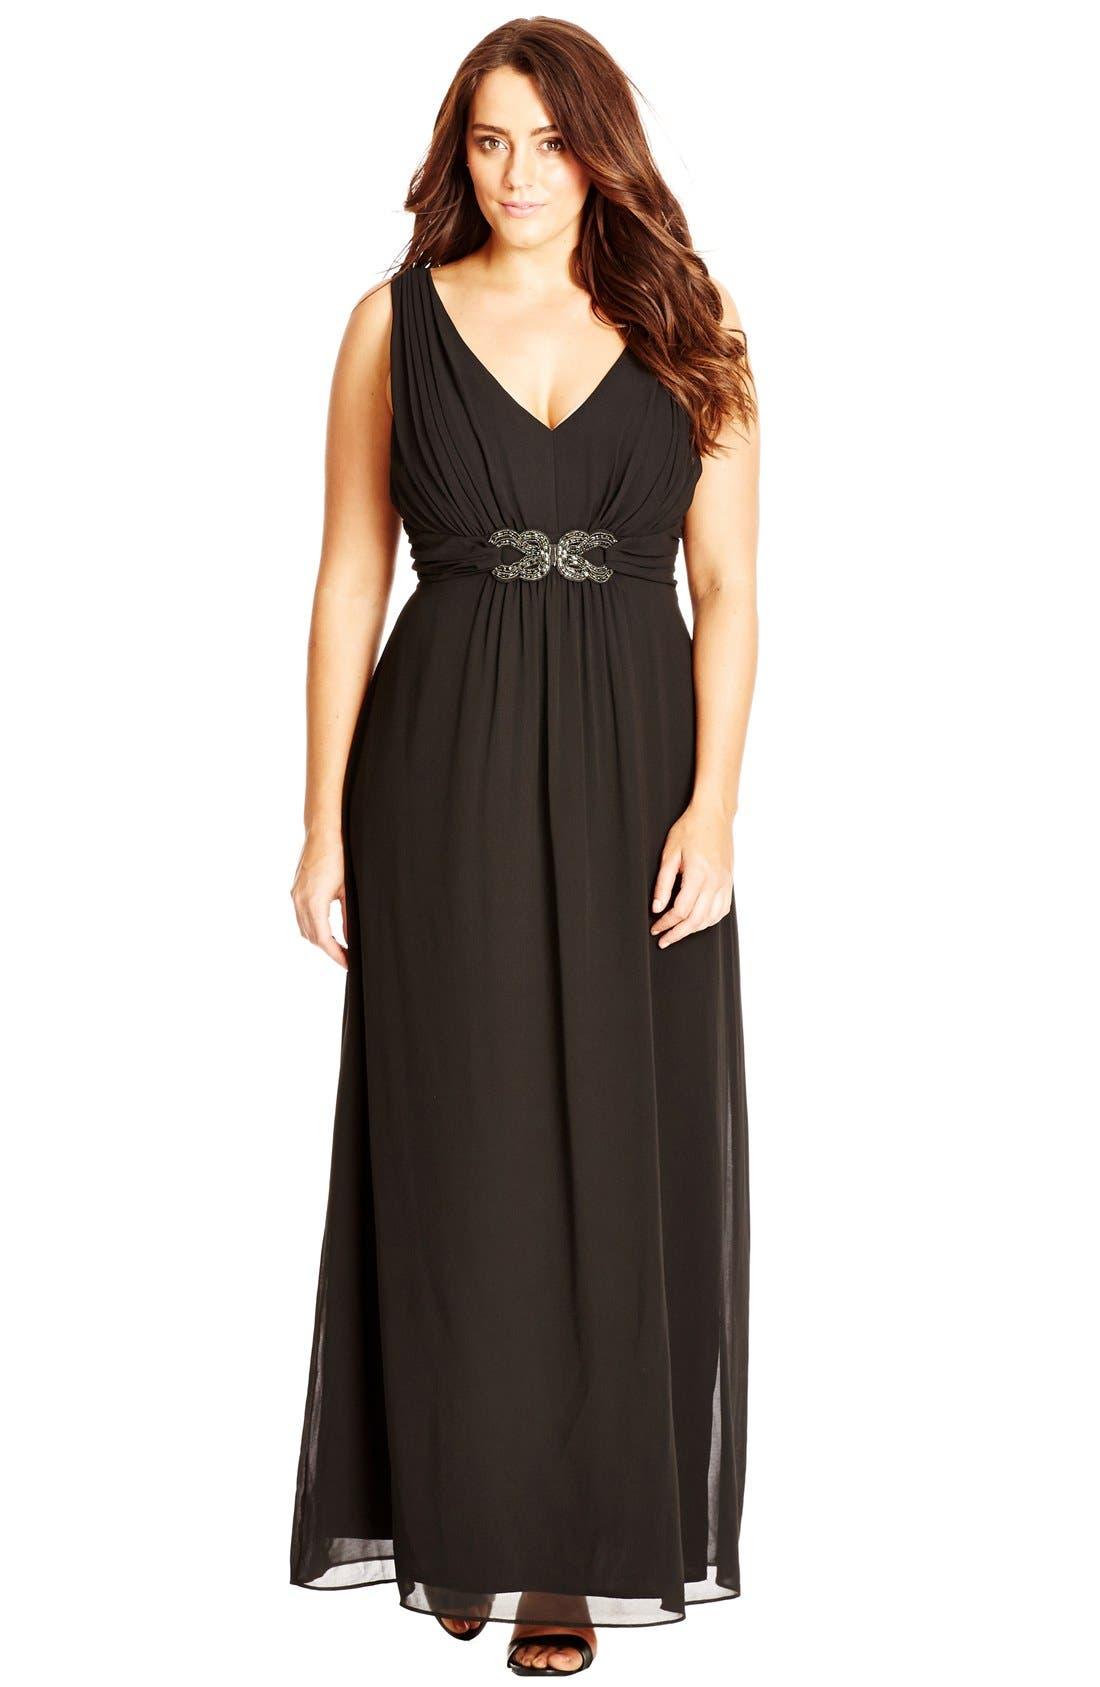 'Elegant Sparkle' Embellished Maxi Dress,                             Alternate thumbnail 2, color,                             Black